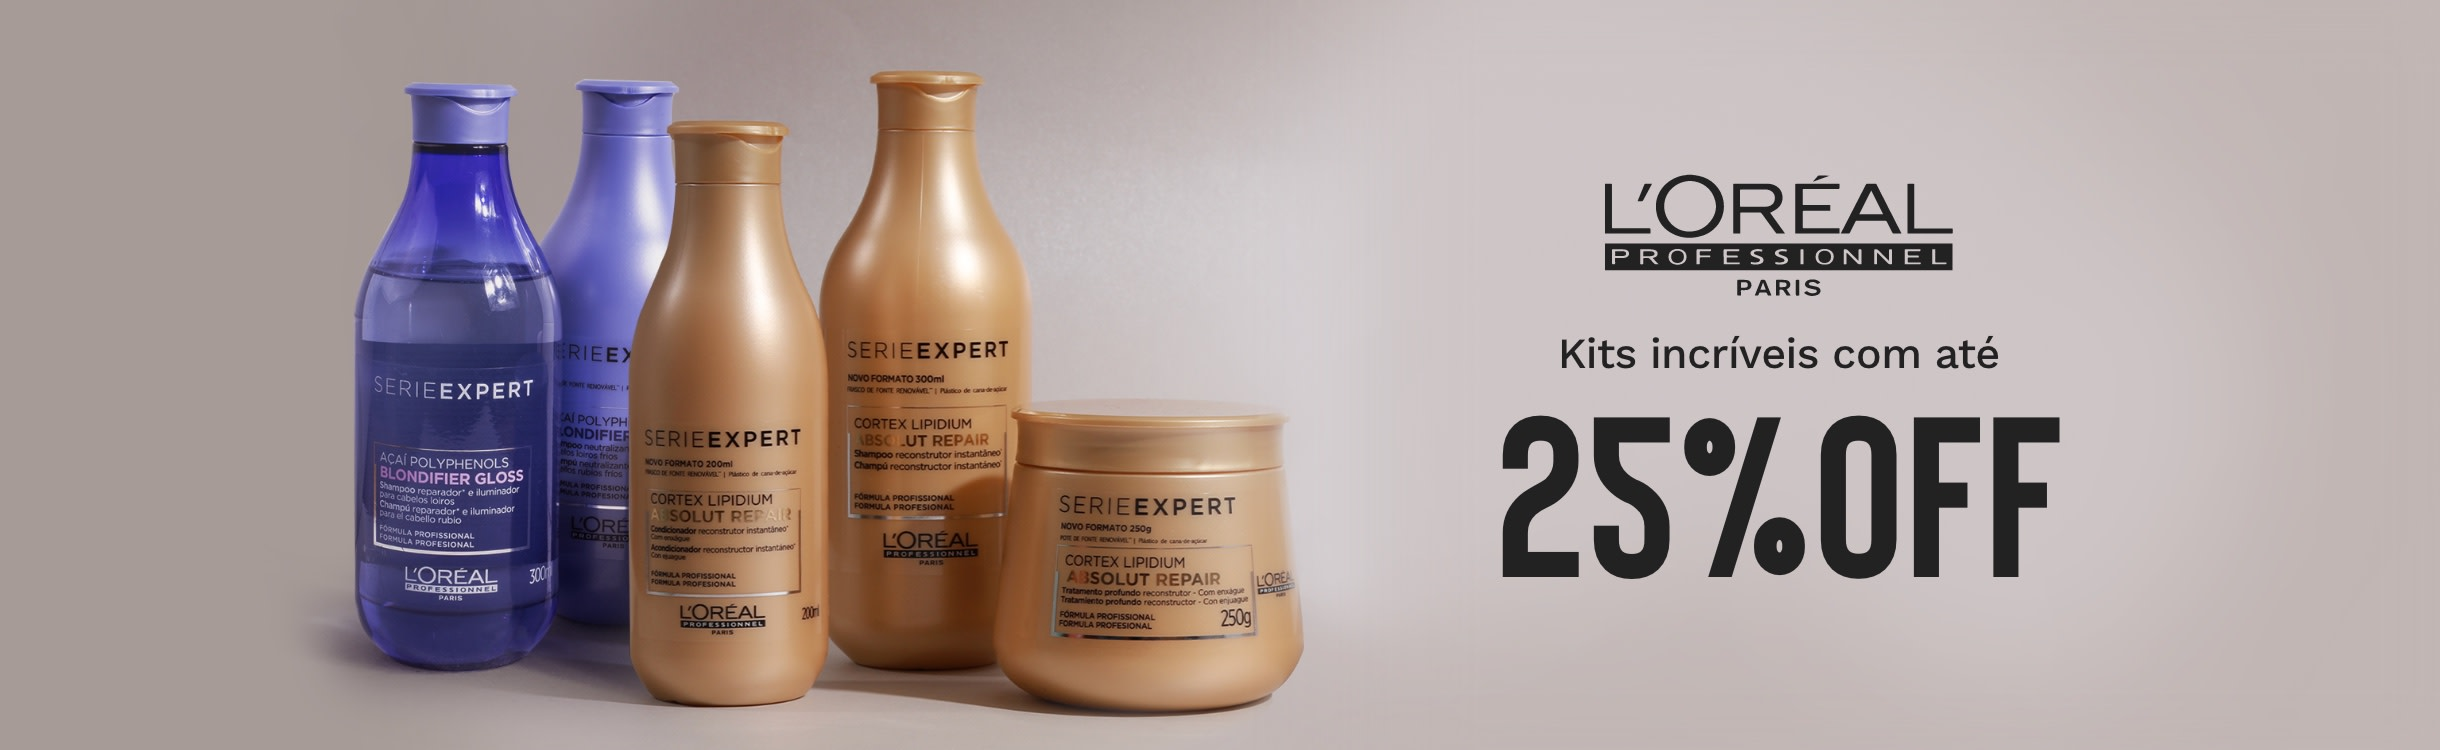 Kits L'Oréal Professionnel para Cabelos